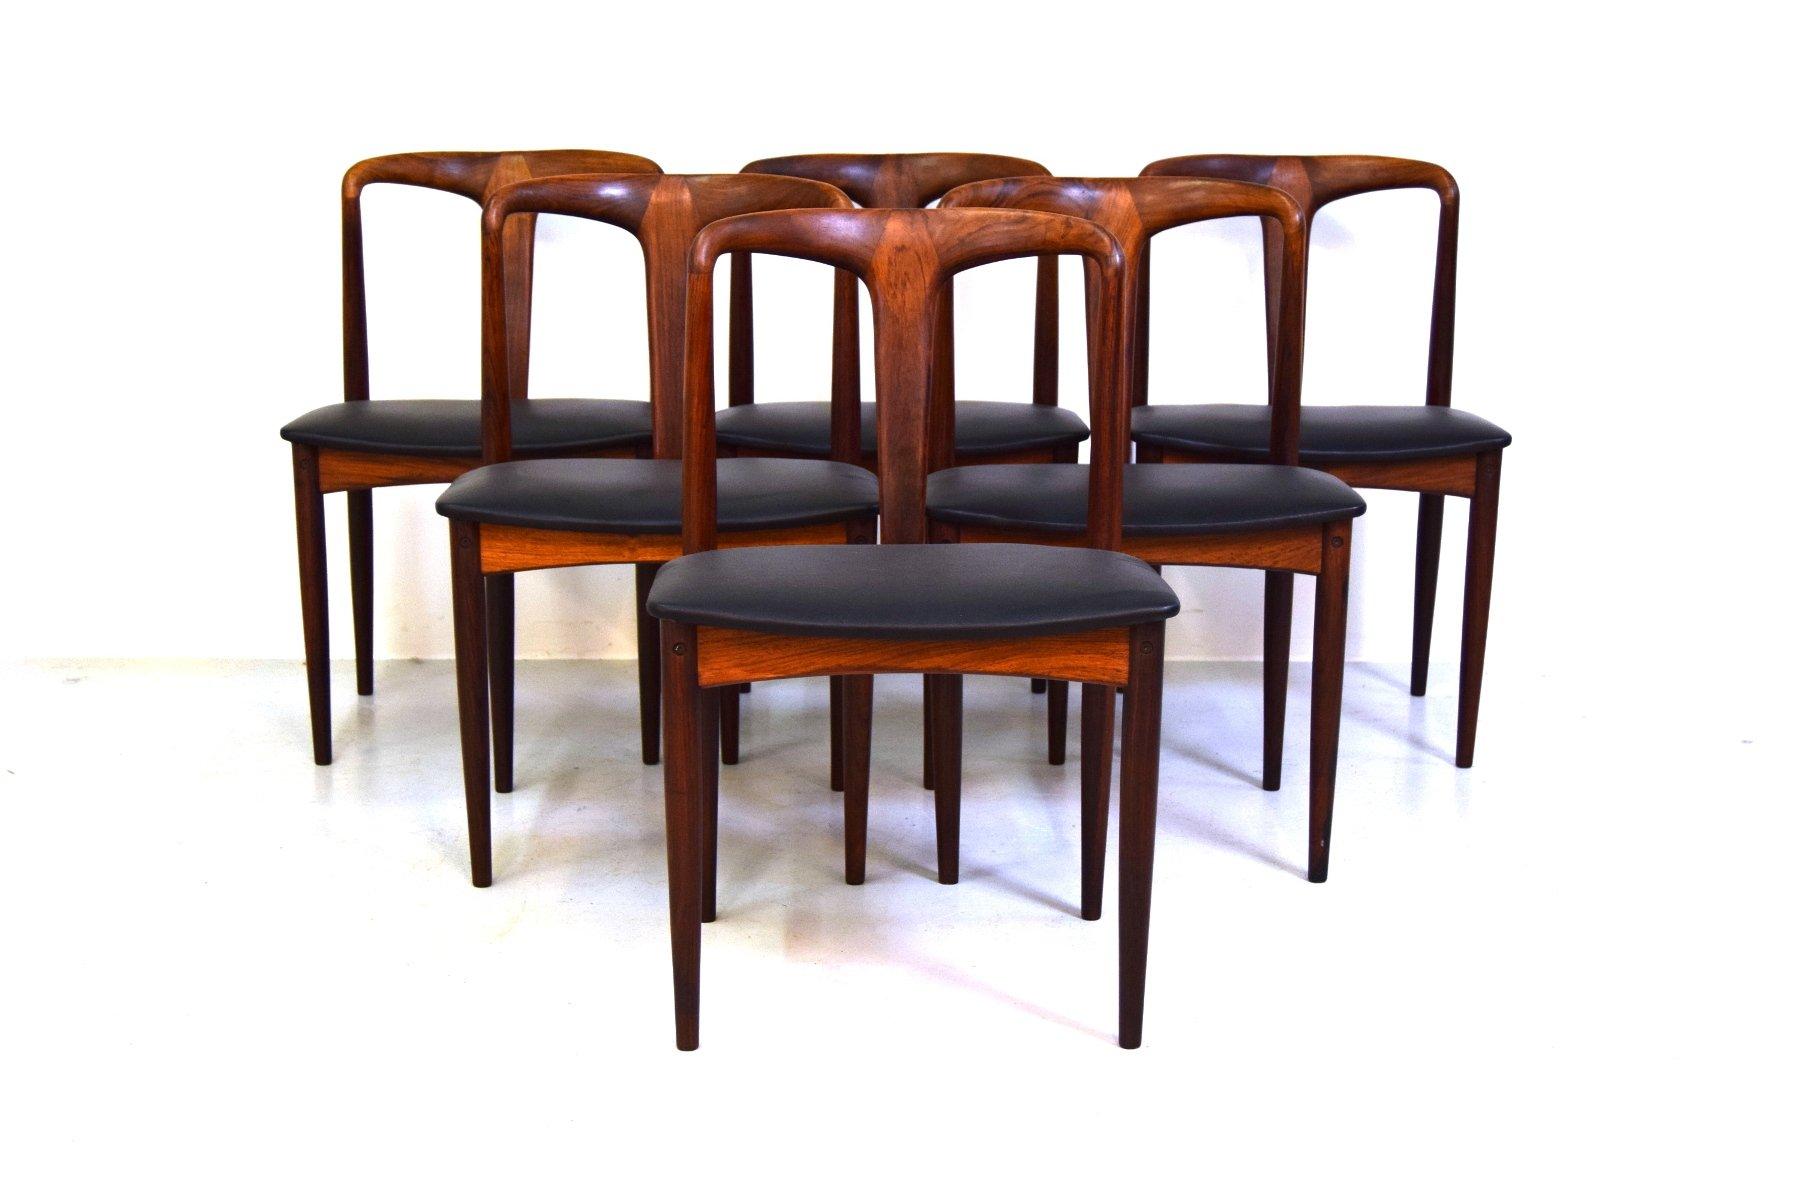 esszimmerst hle von johannes andersen f r vamo m belfabrik. Black Bedroom Furniture Sets. Home Design Ideas